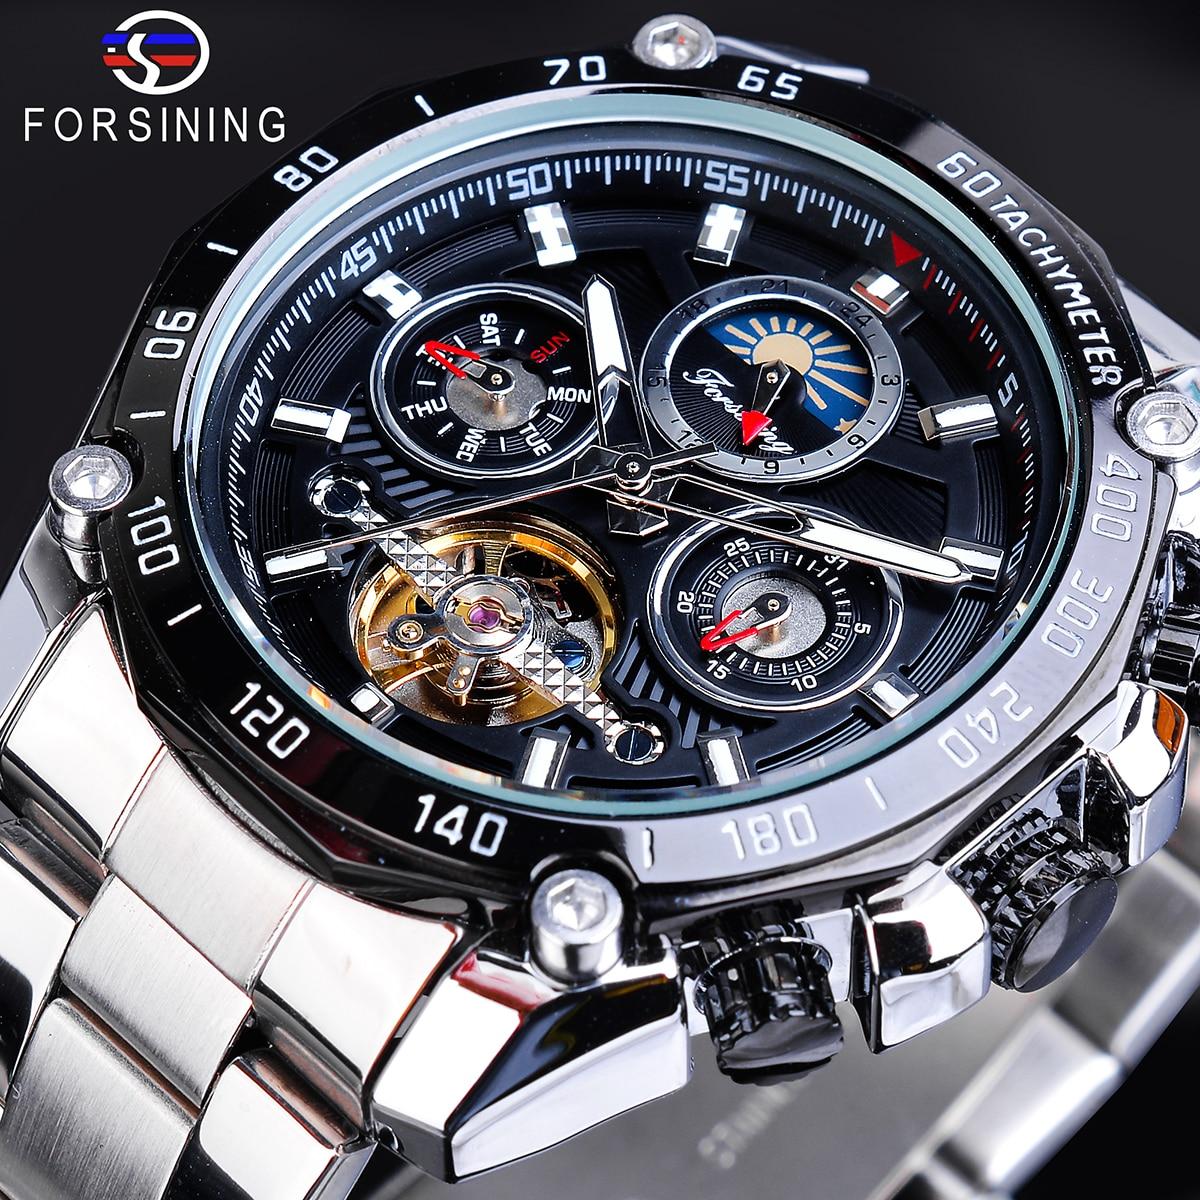 Forsining Classic Black Men's Mechanical Watch Tourbillon Automatic Moon Phase Calendar Military Sport Steel Wristwatch Relojes